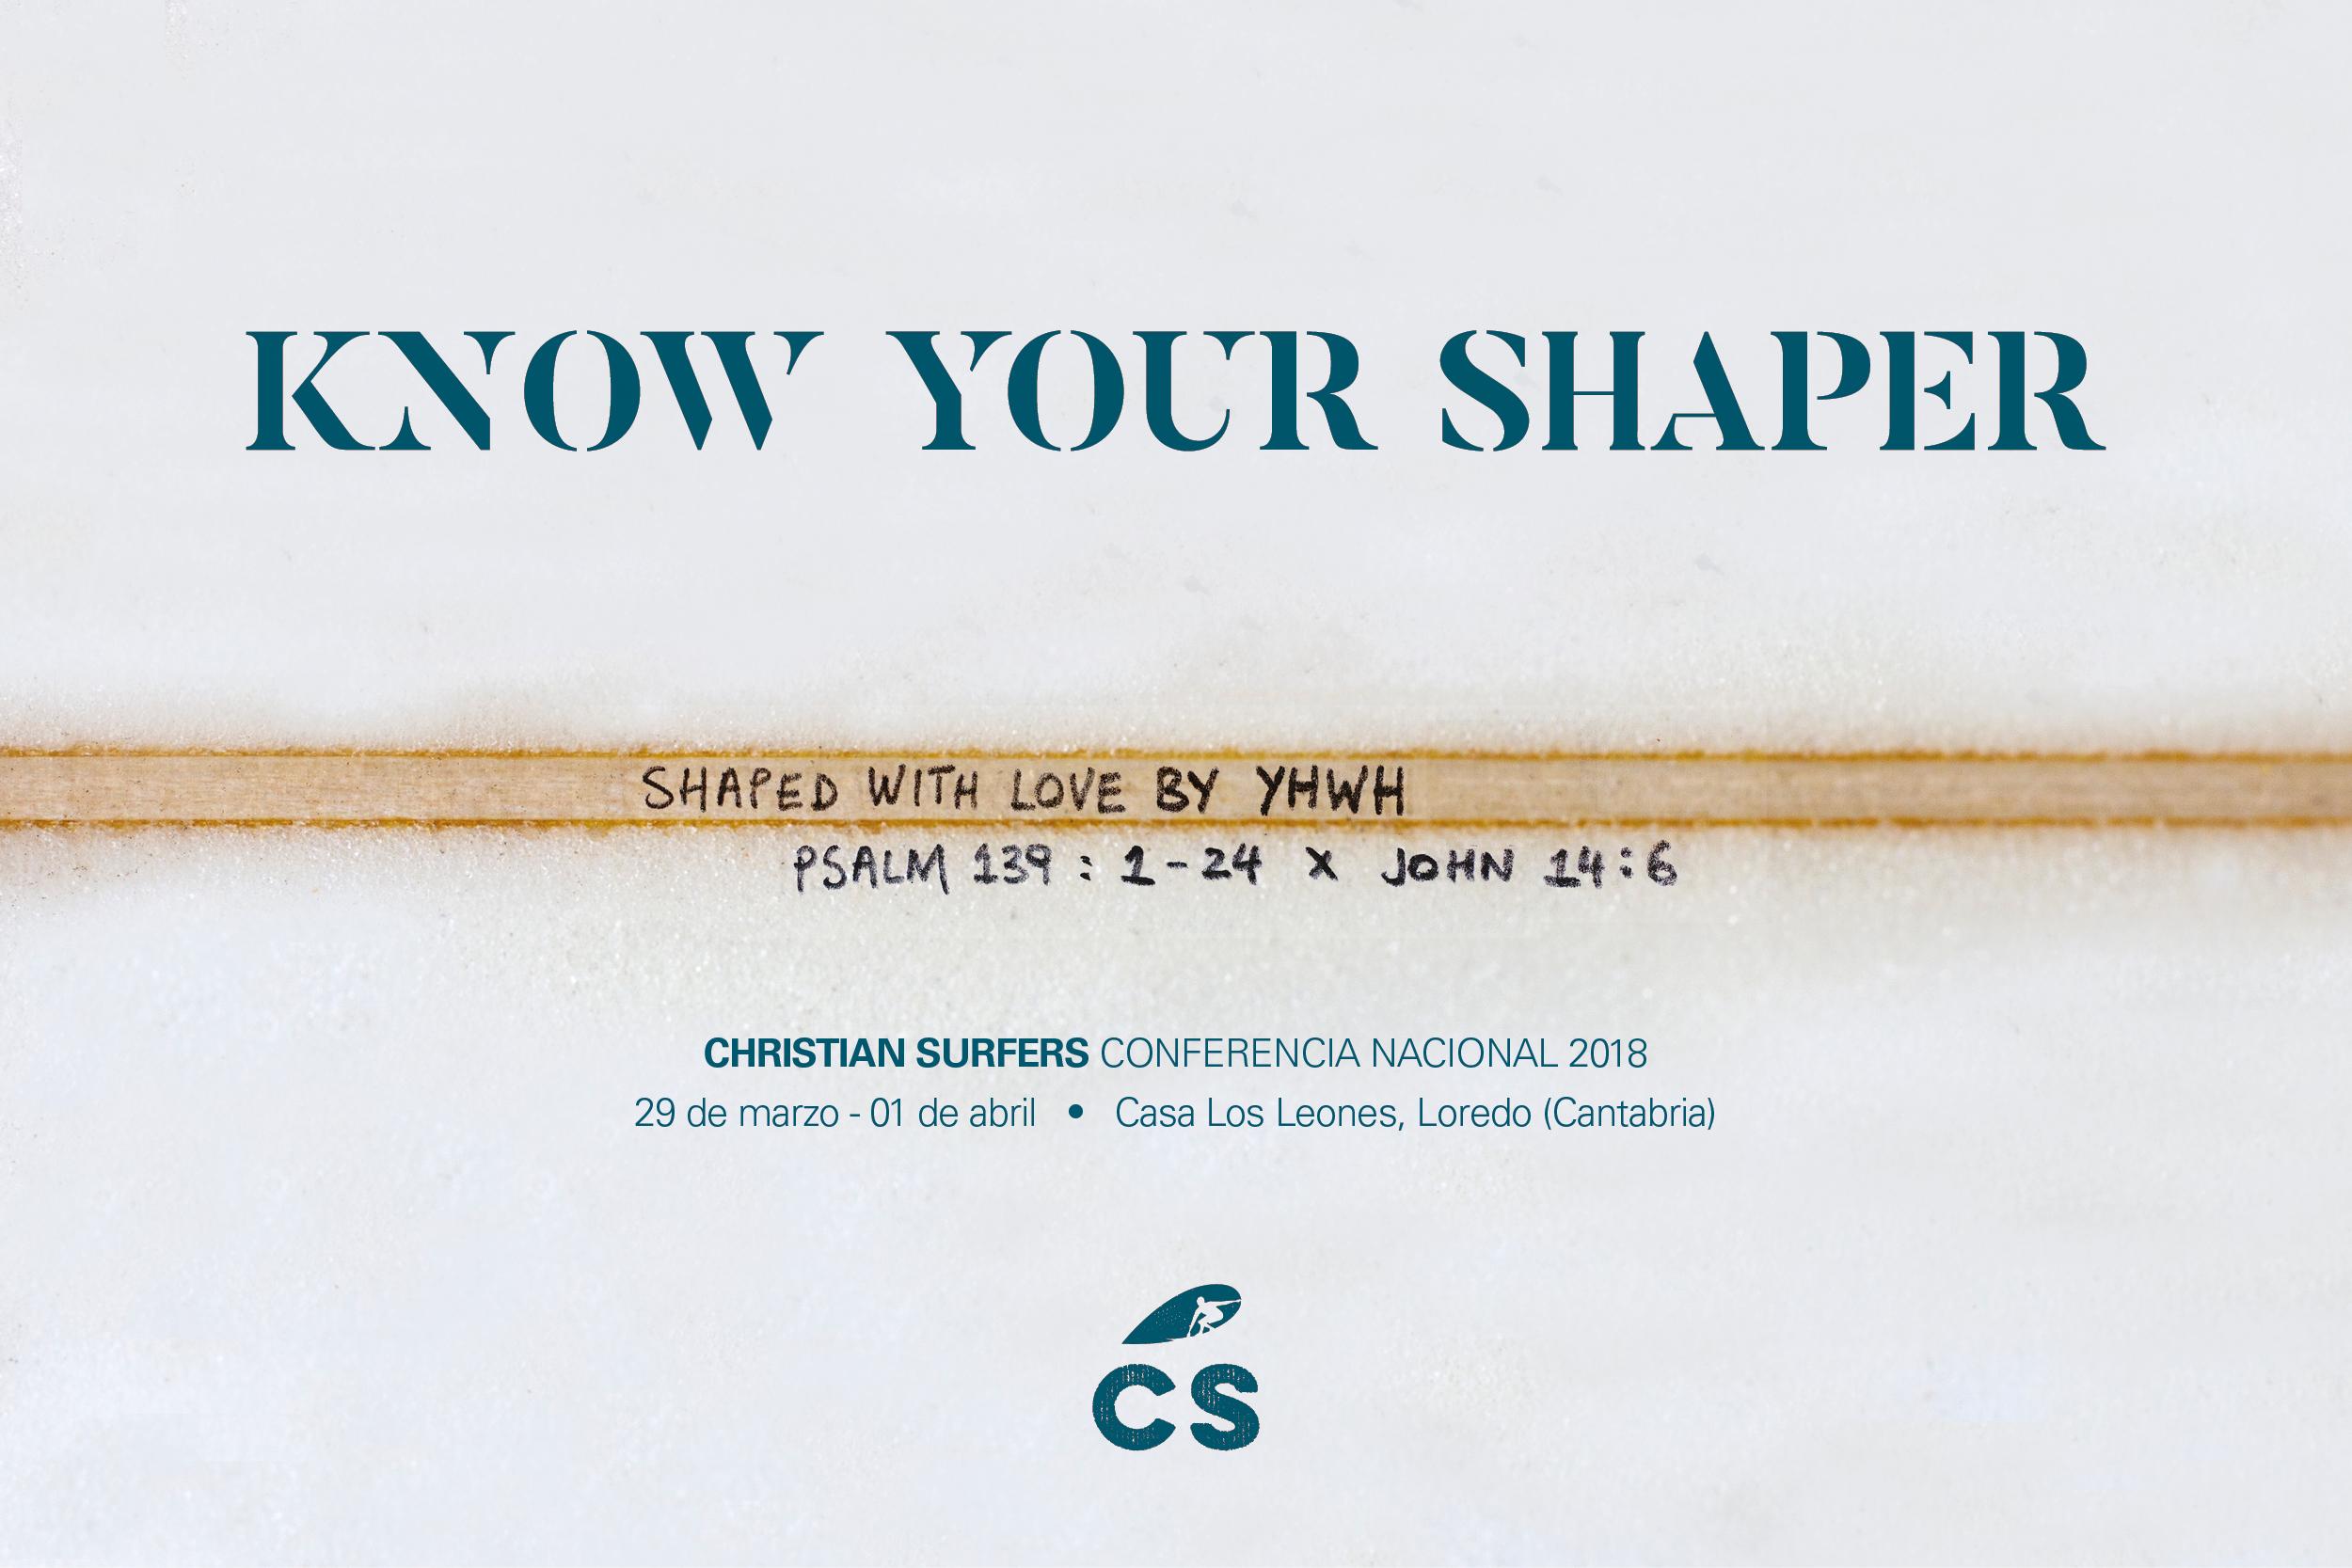 conferencia nacional christian surfers españa 2018